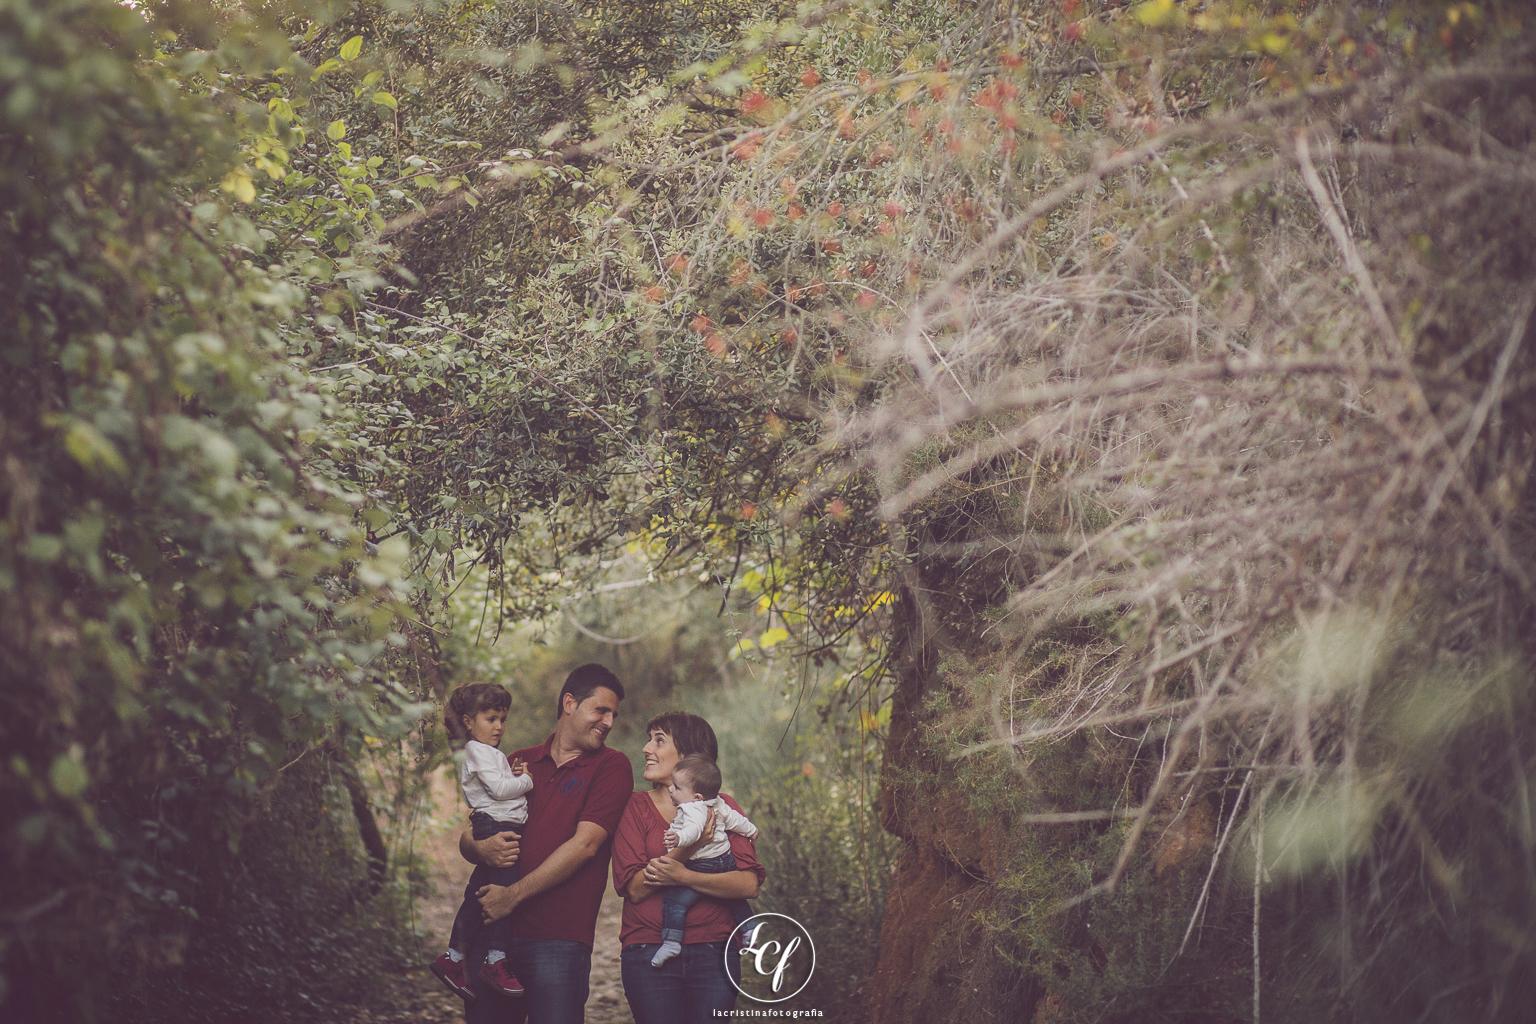 fotógrafo de familia :: fotografía familiar collbató :: montserrat ::: fotografía infantil :: fotógrafo infantil